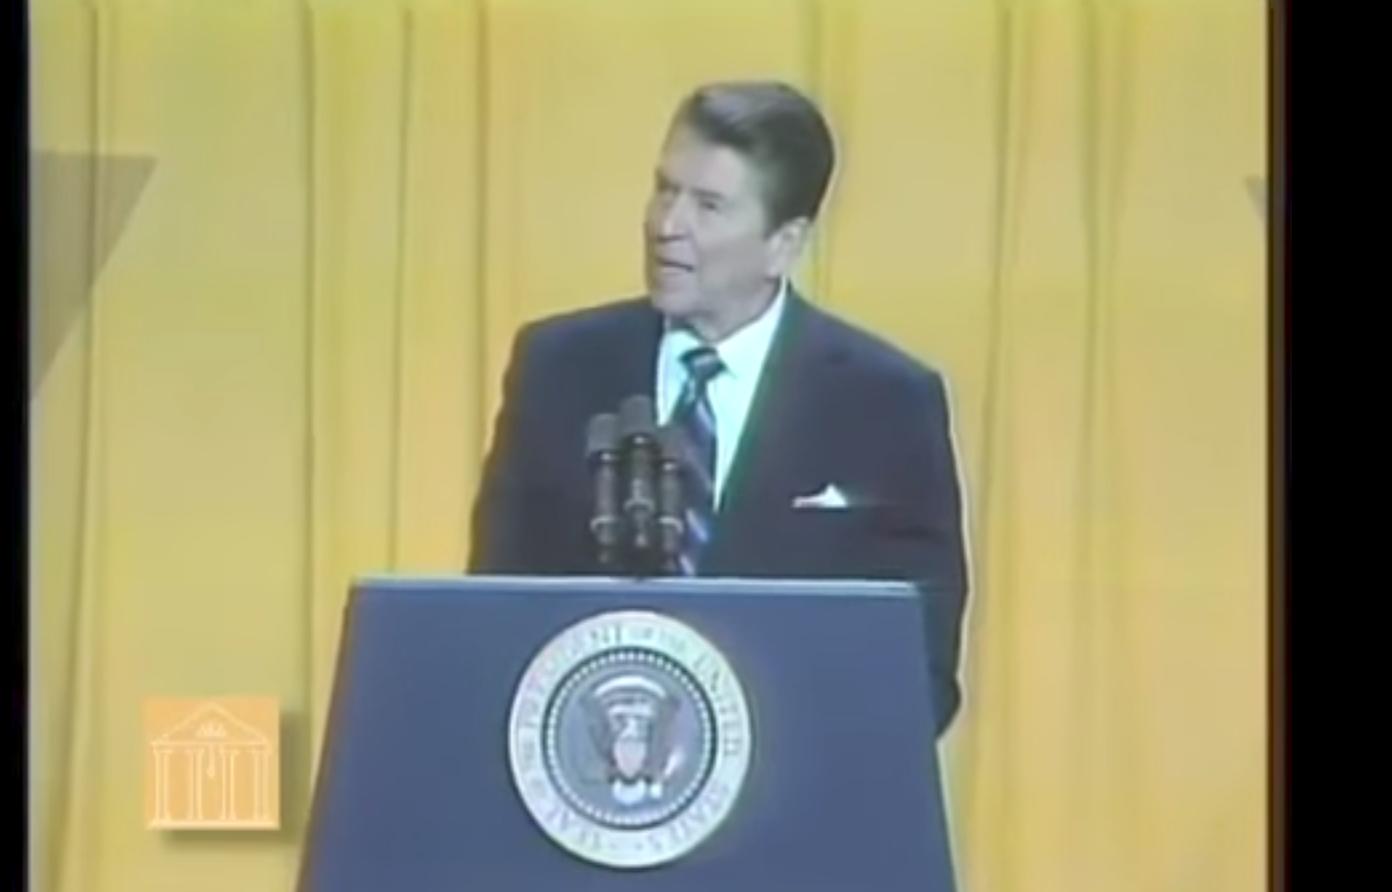 Flashback: Ronald Reagan's powerful rebuke of hate groups